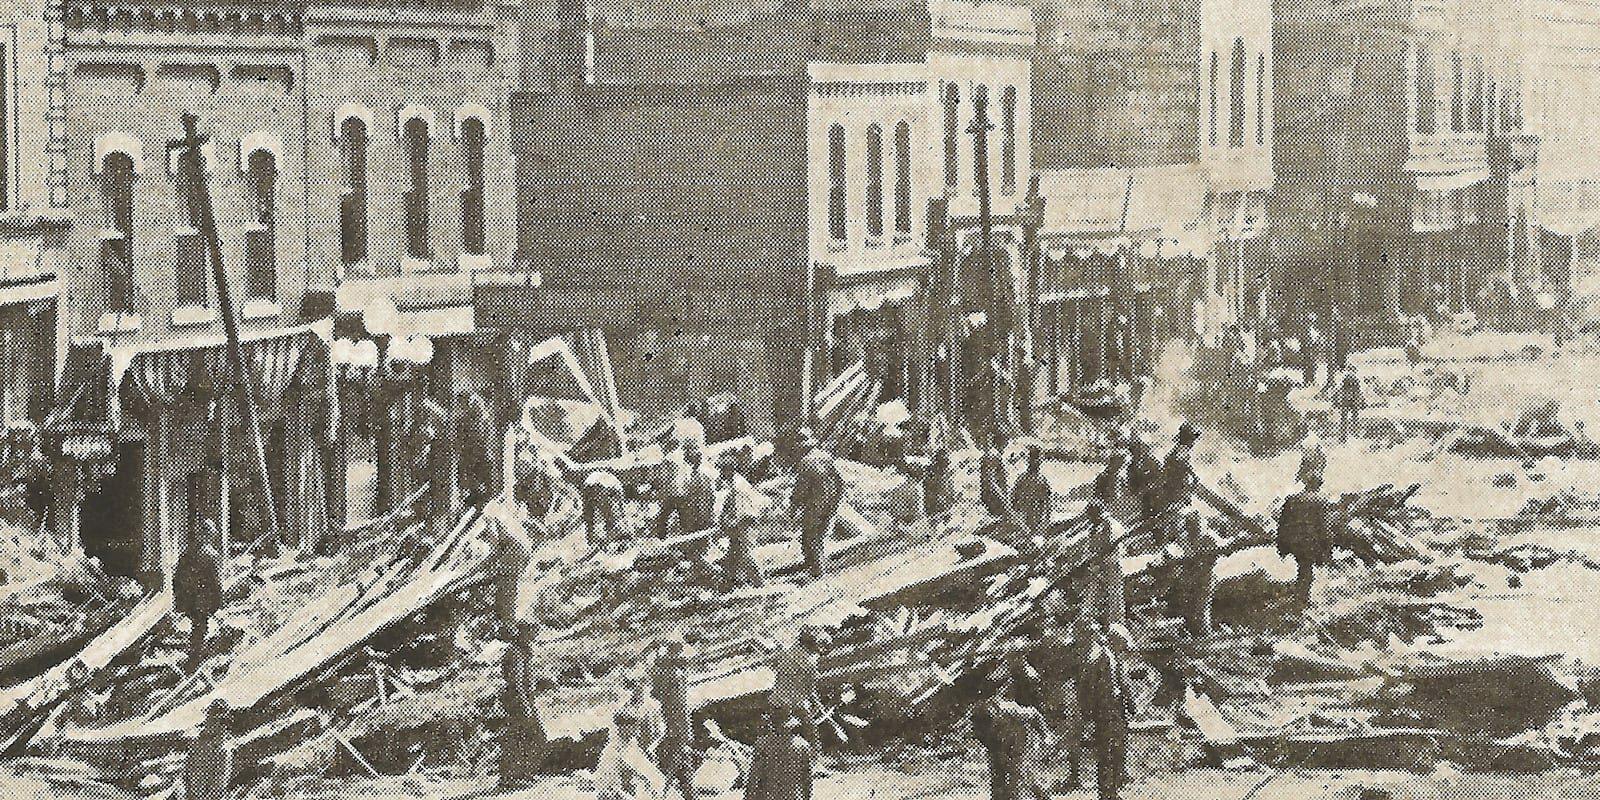 Downtown Pueblo CO Stores After 1921 Flood